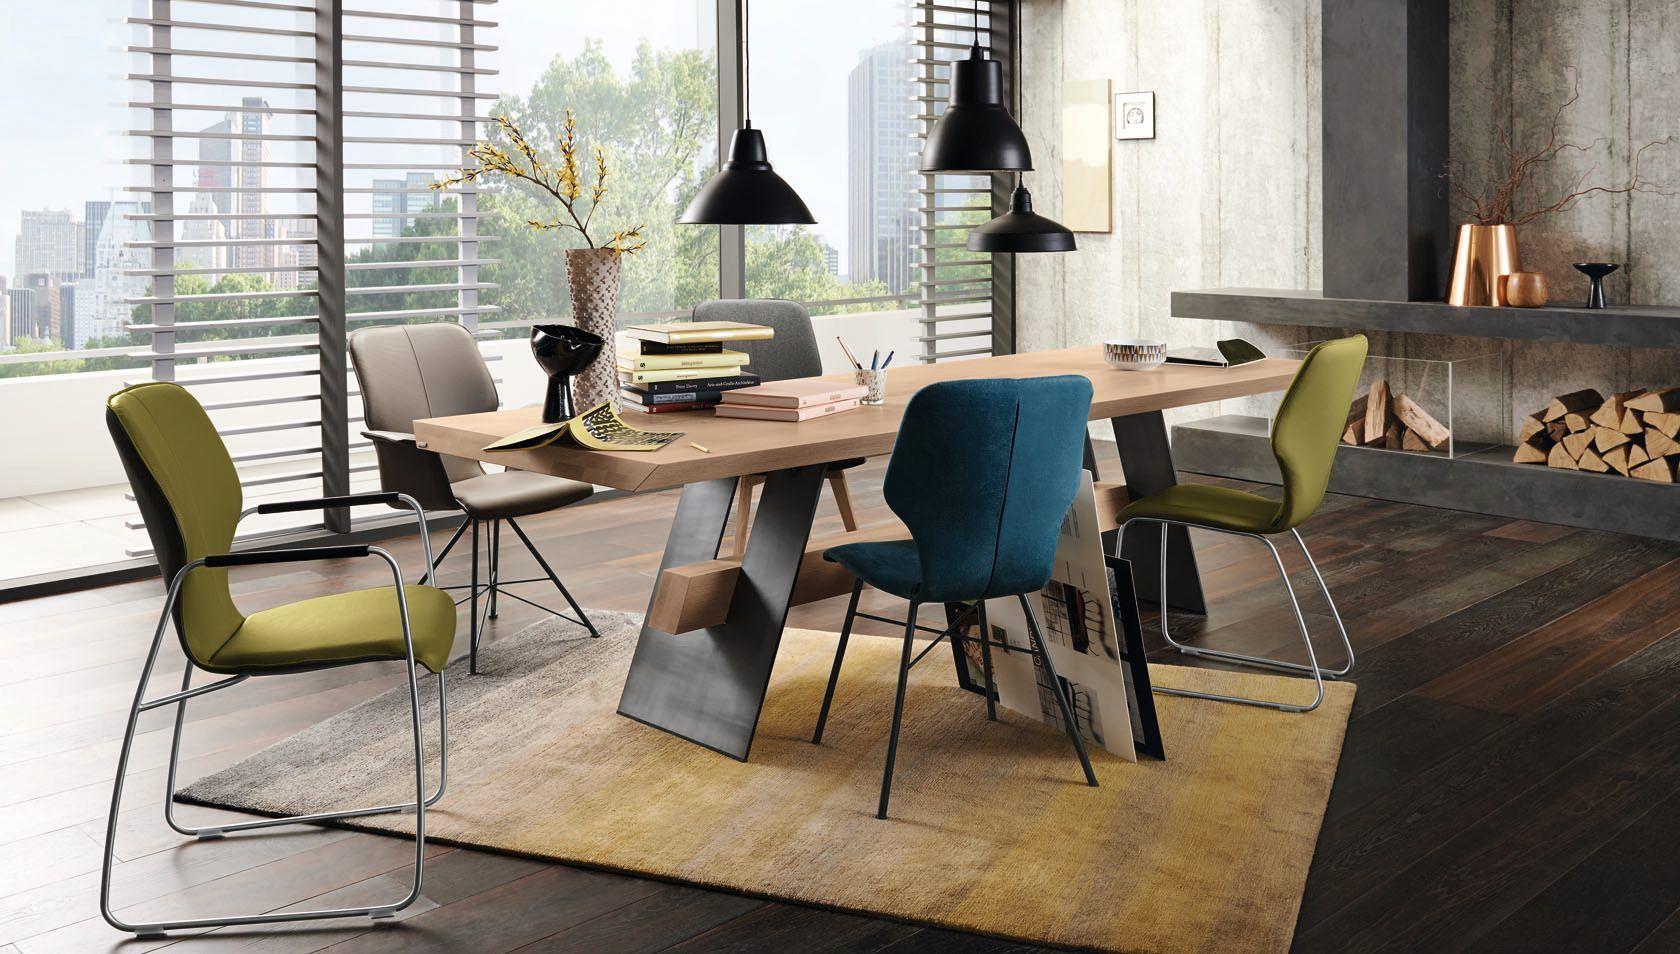 best 25+ musterring möbel ideas on pinterest | musterring, Esszimmer dekoo